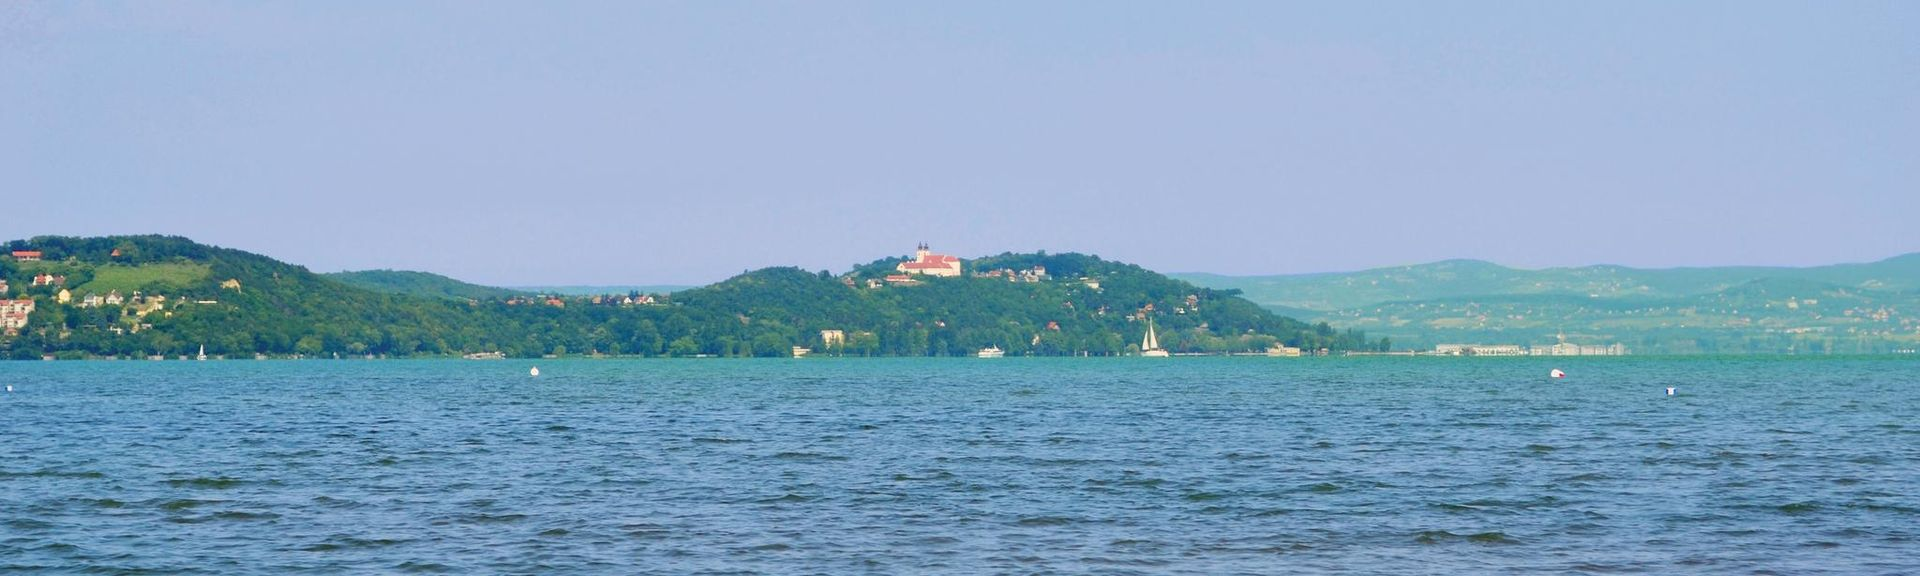 Balatonőszöd, Somogy County, Hungary